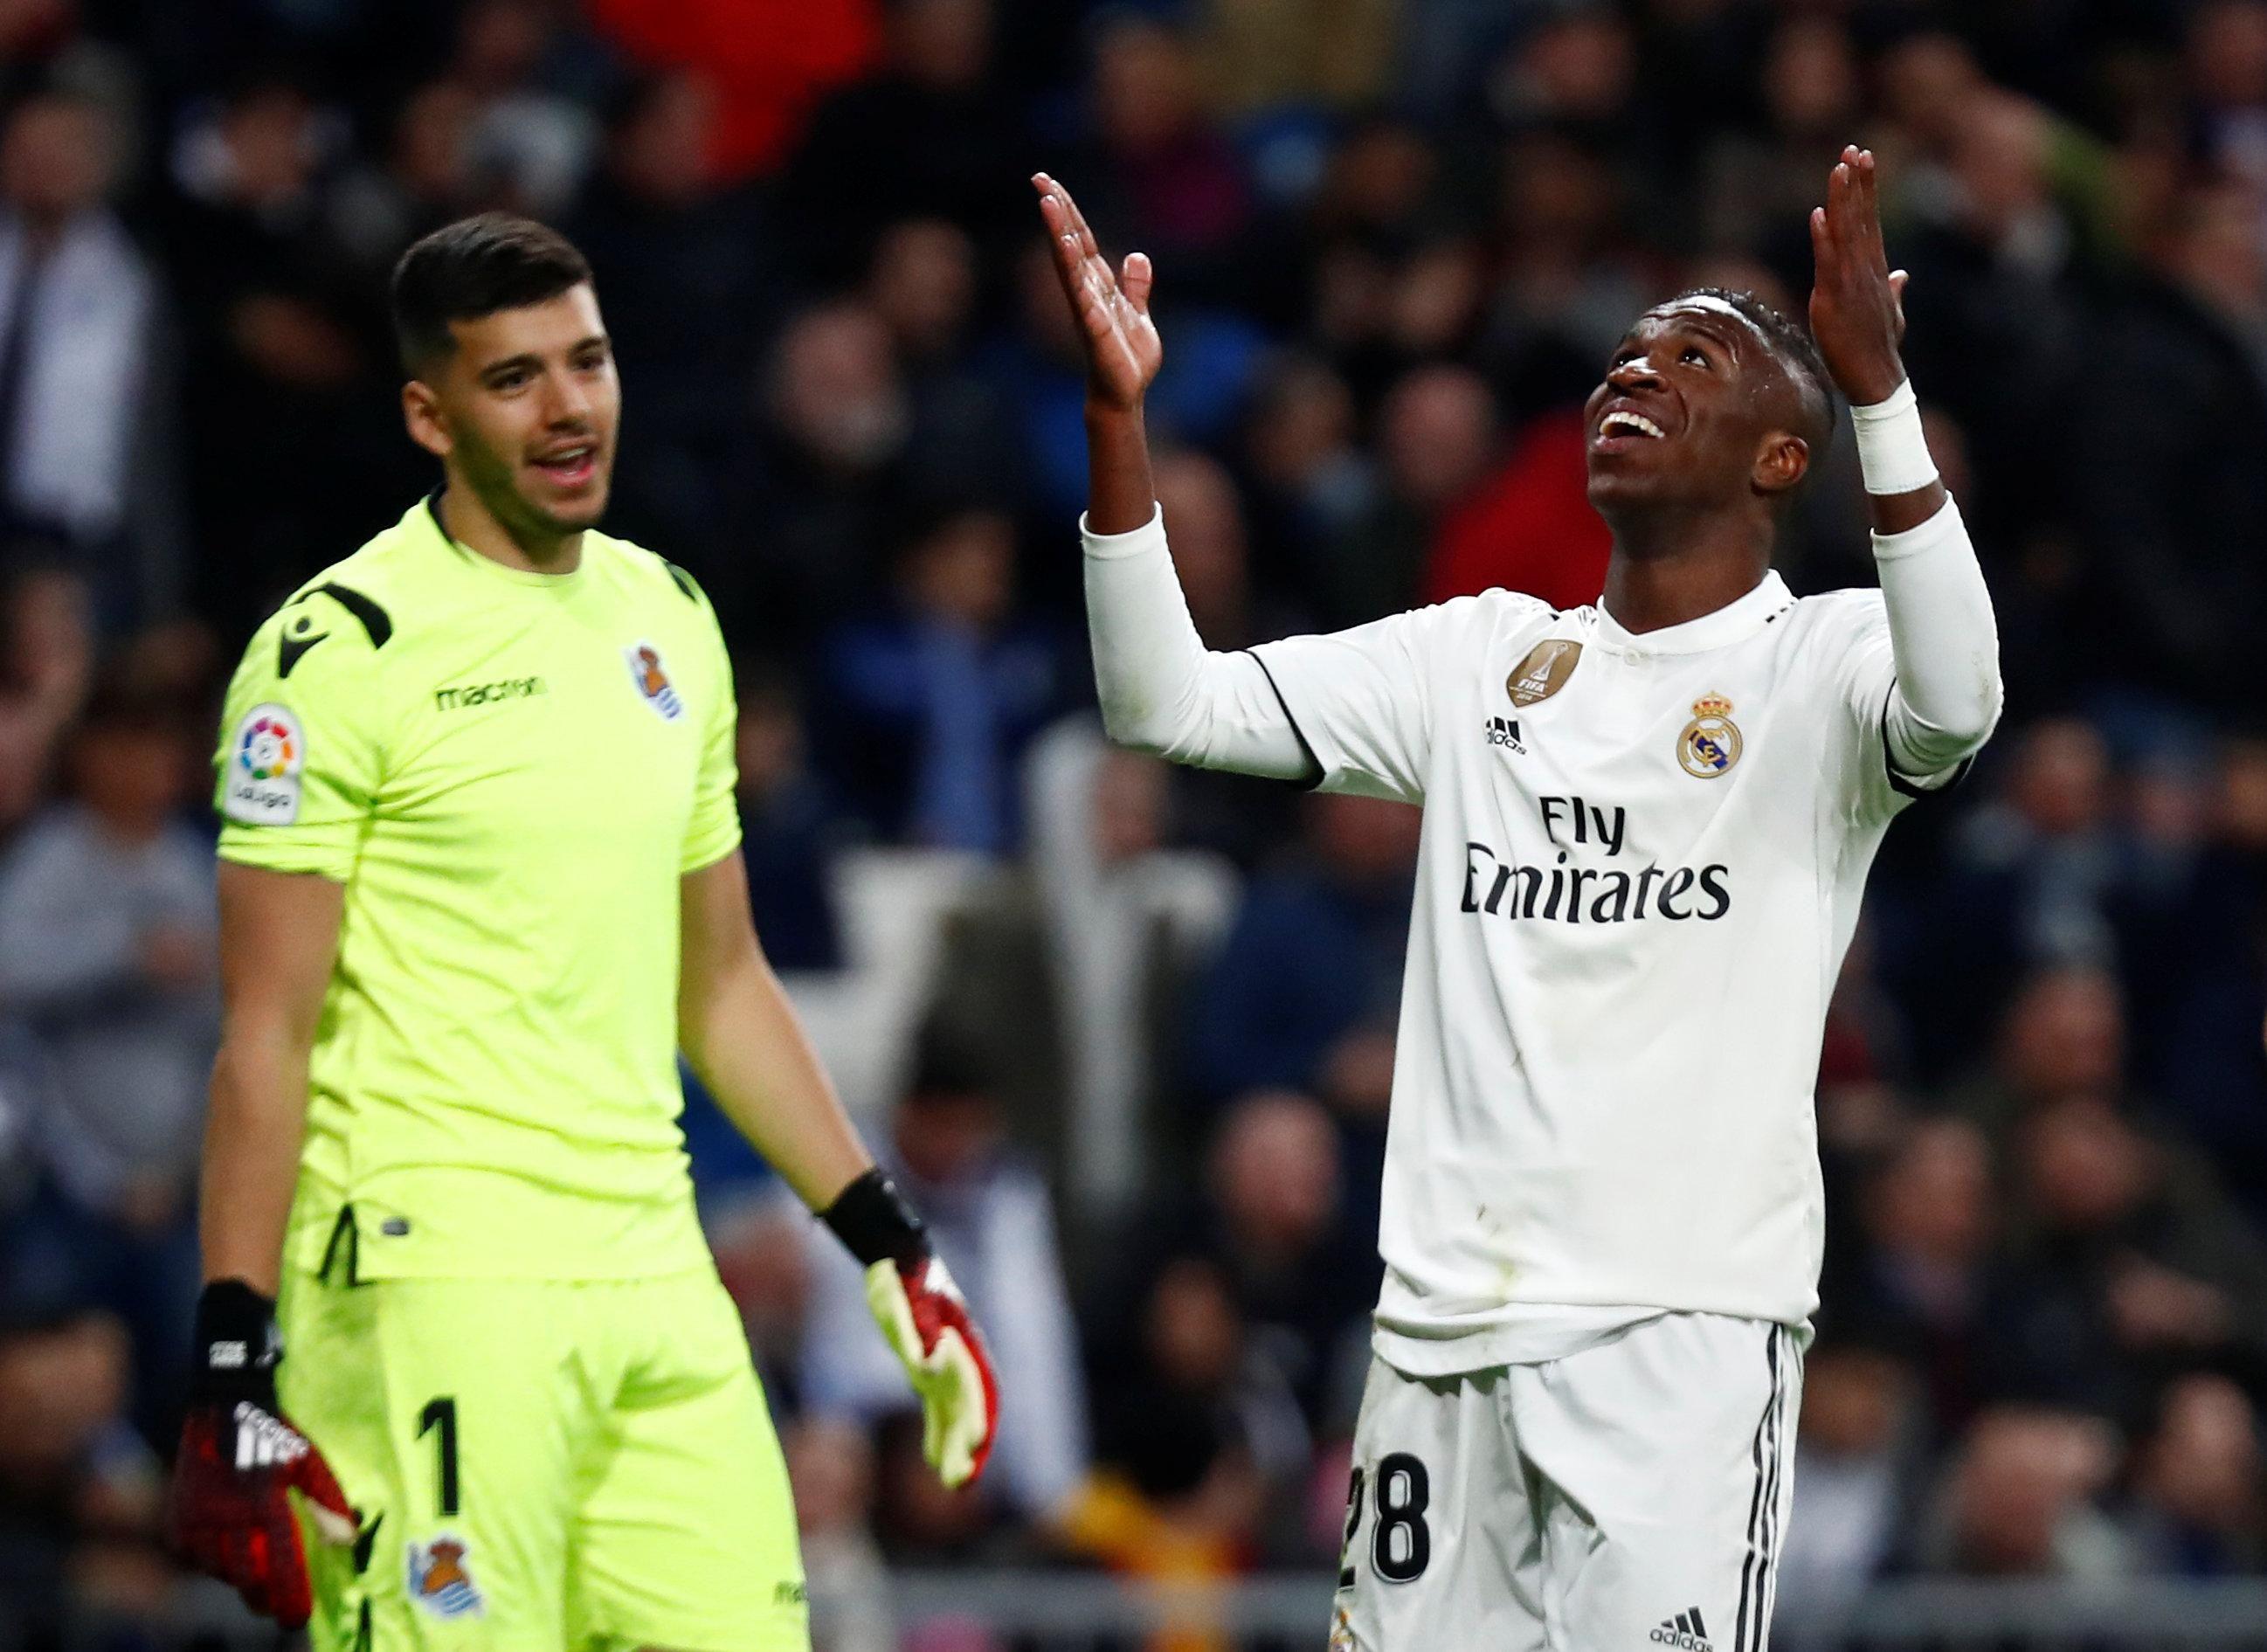 Vea los goles de la derrota del Real Madrid